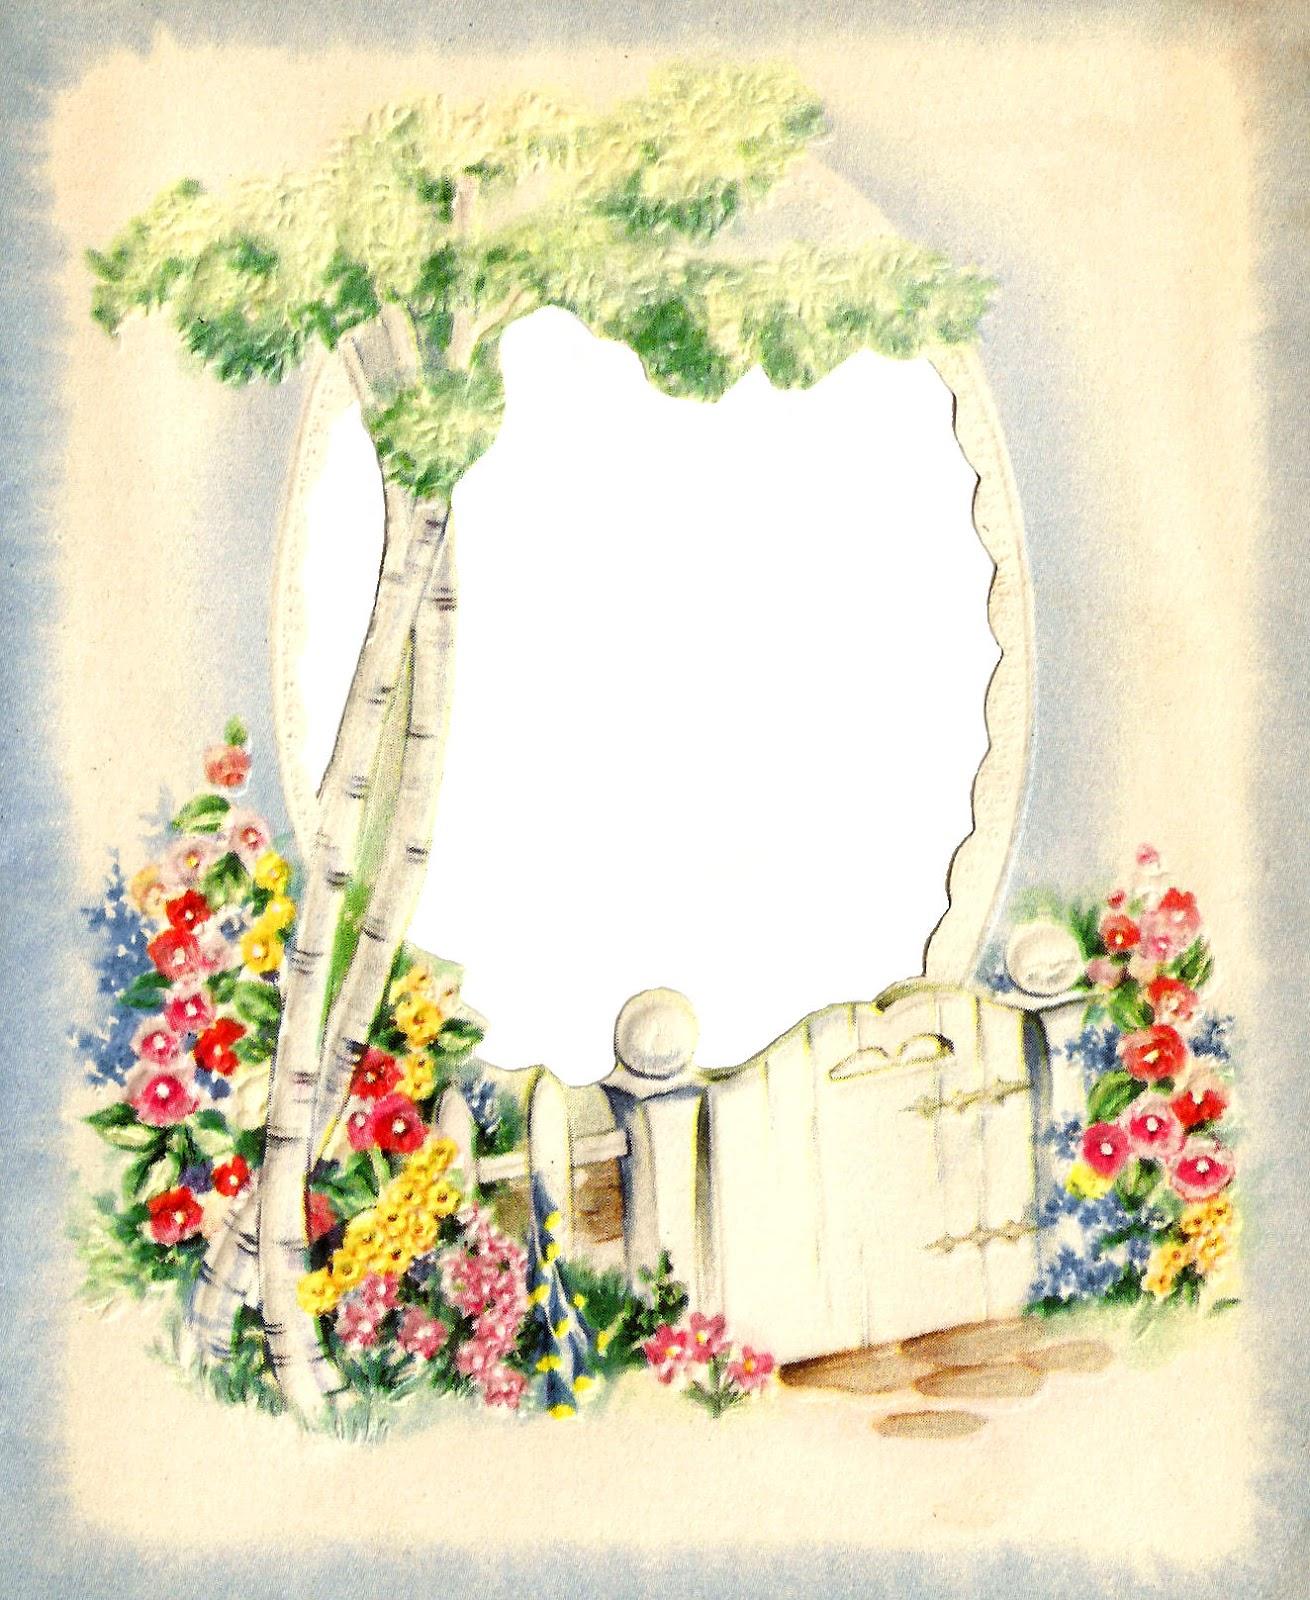 Gate clipart garden frame Digital Images: Garden flowers Flower